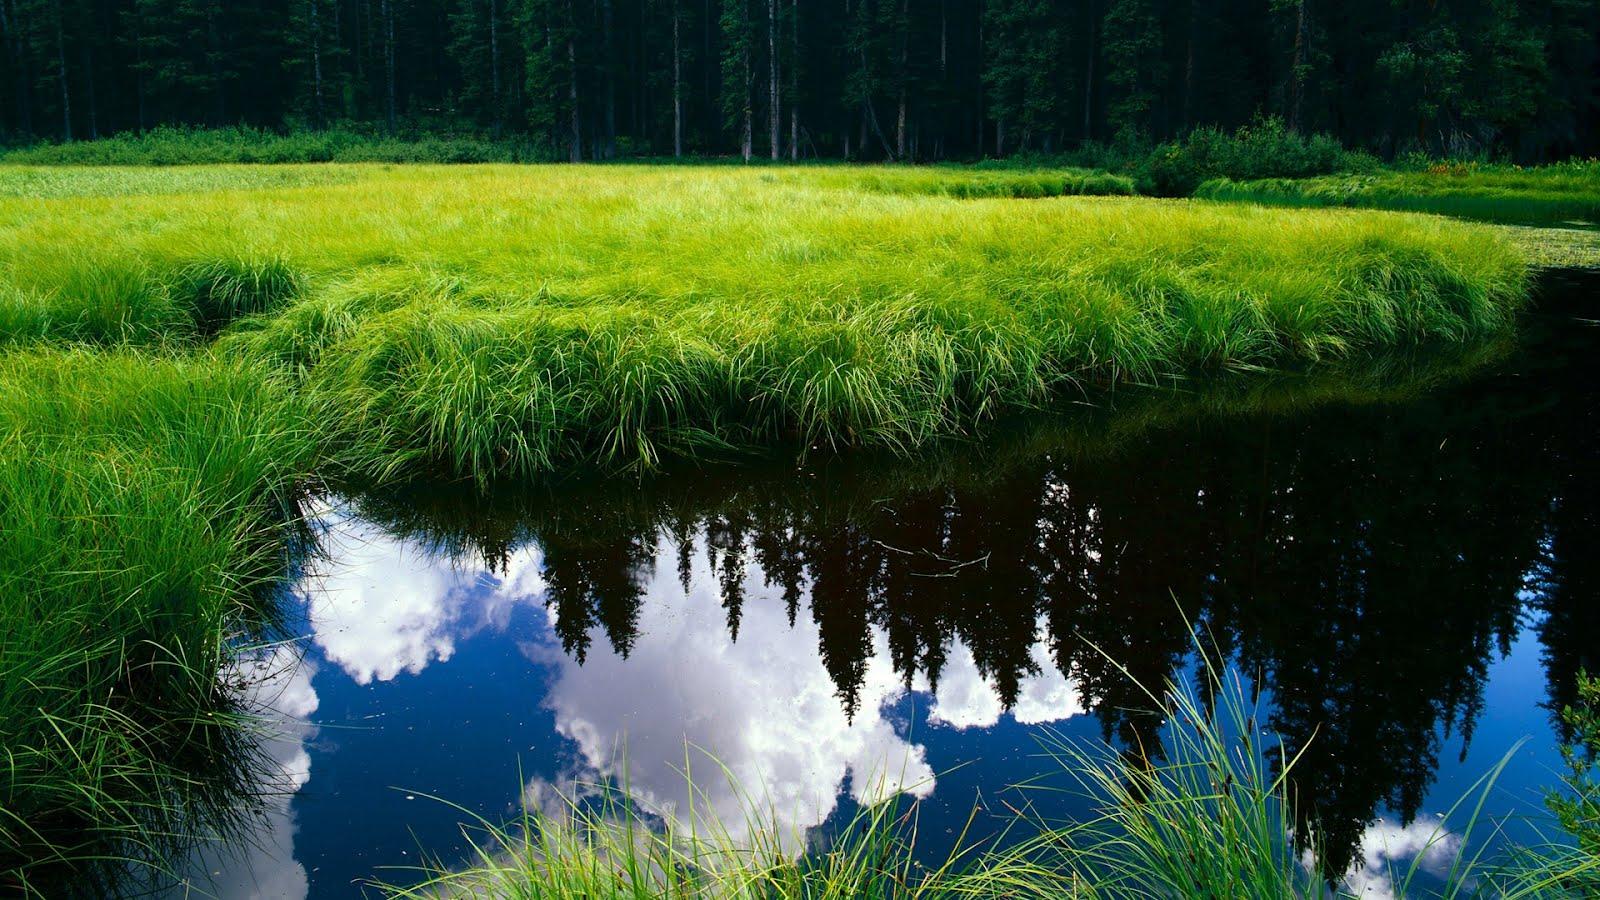 Download Nature Wallpapers Full HD 1080p Photo Desktop Backgrounds 1600x900